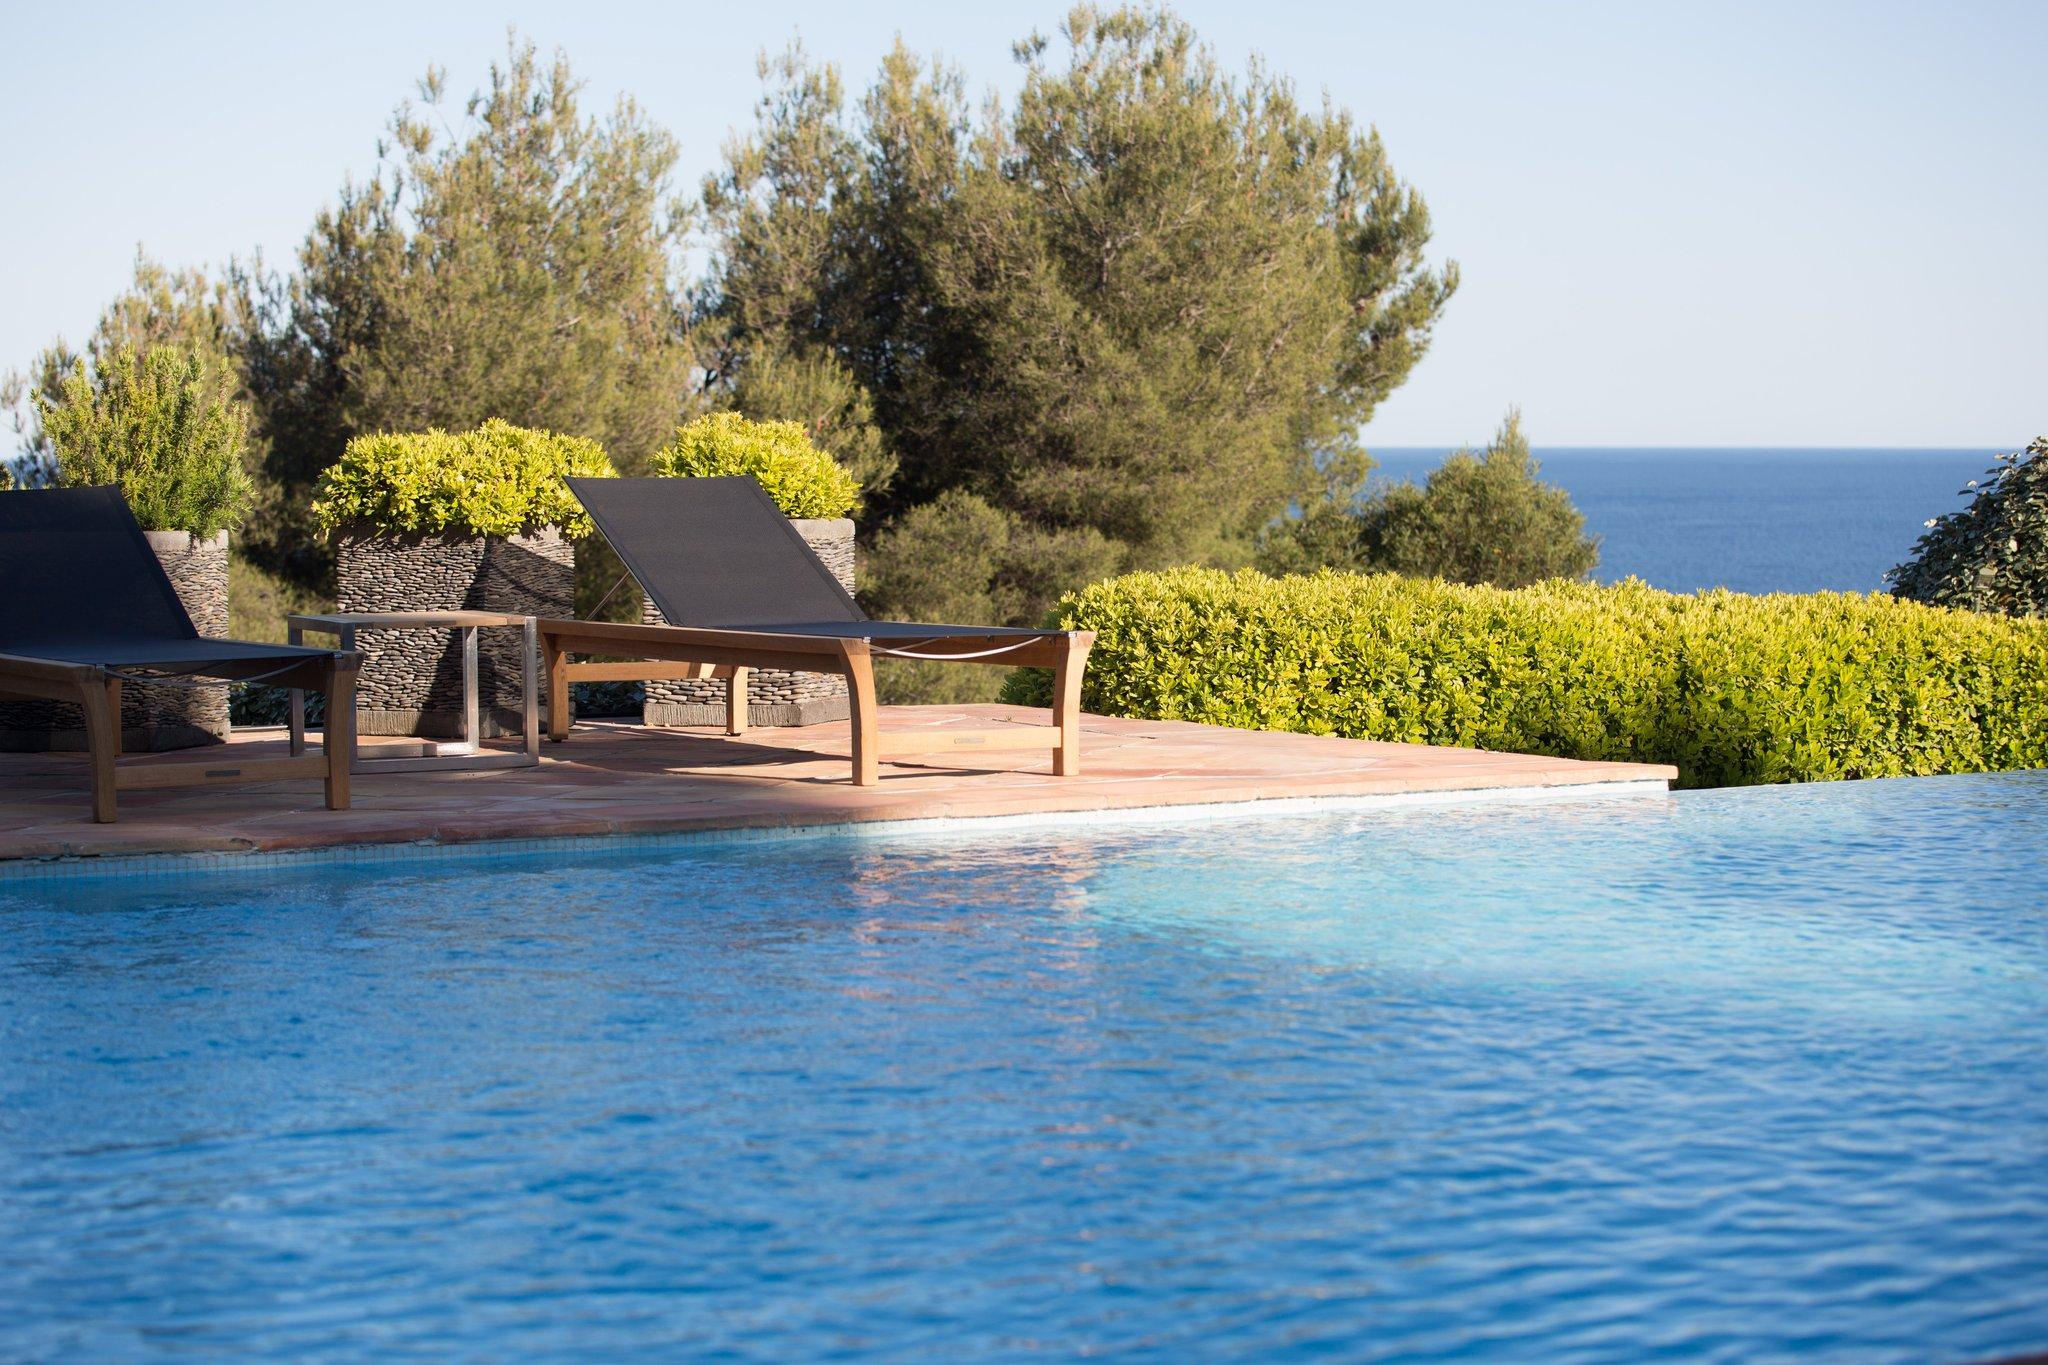 La Reserve Hotel Ramatuelle